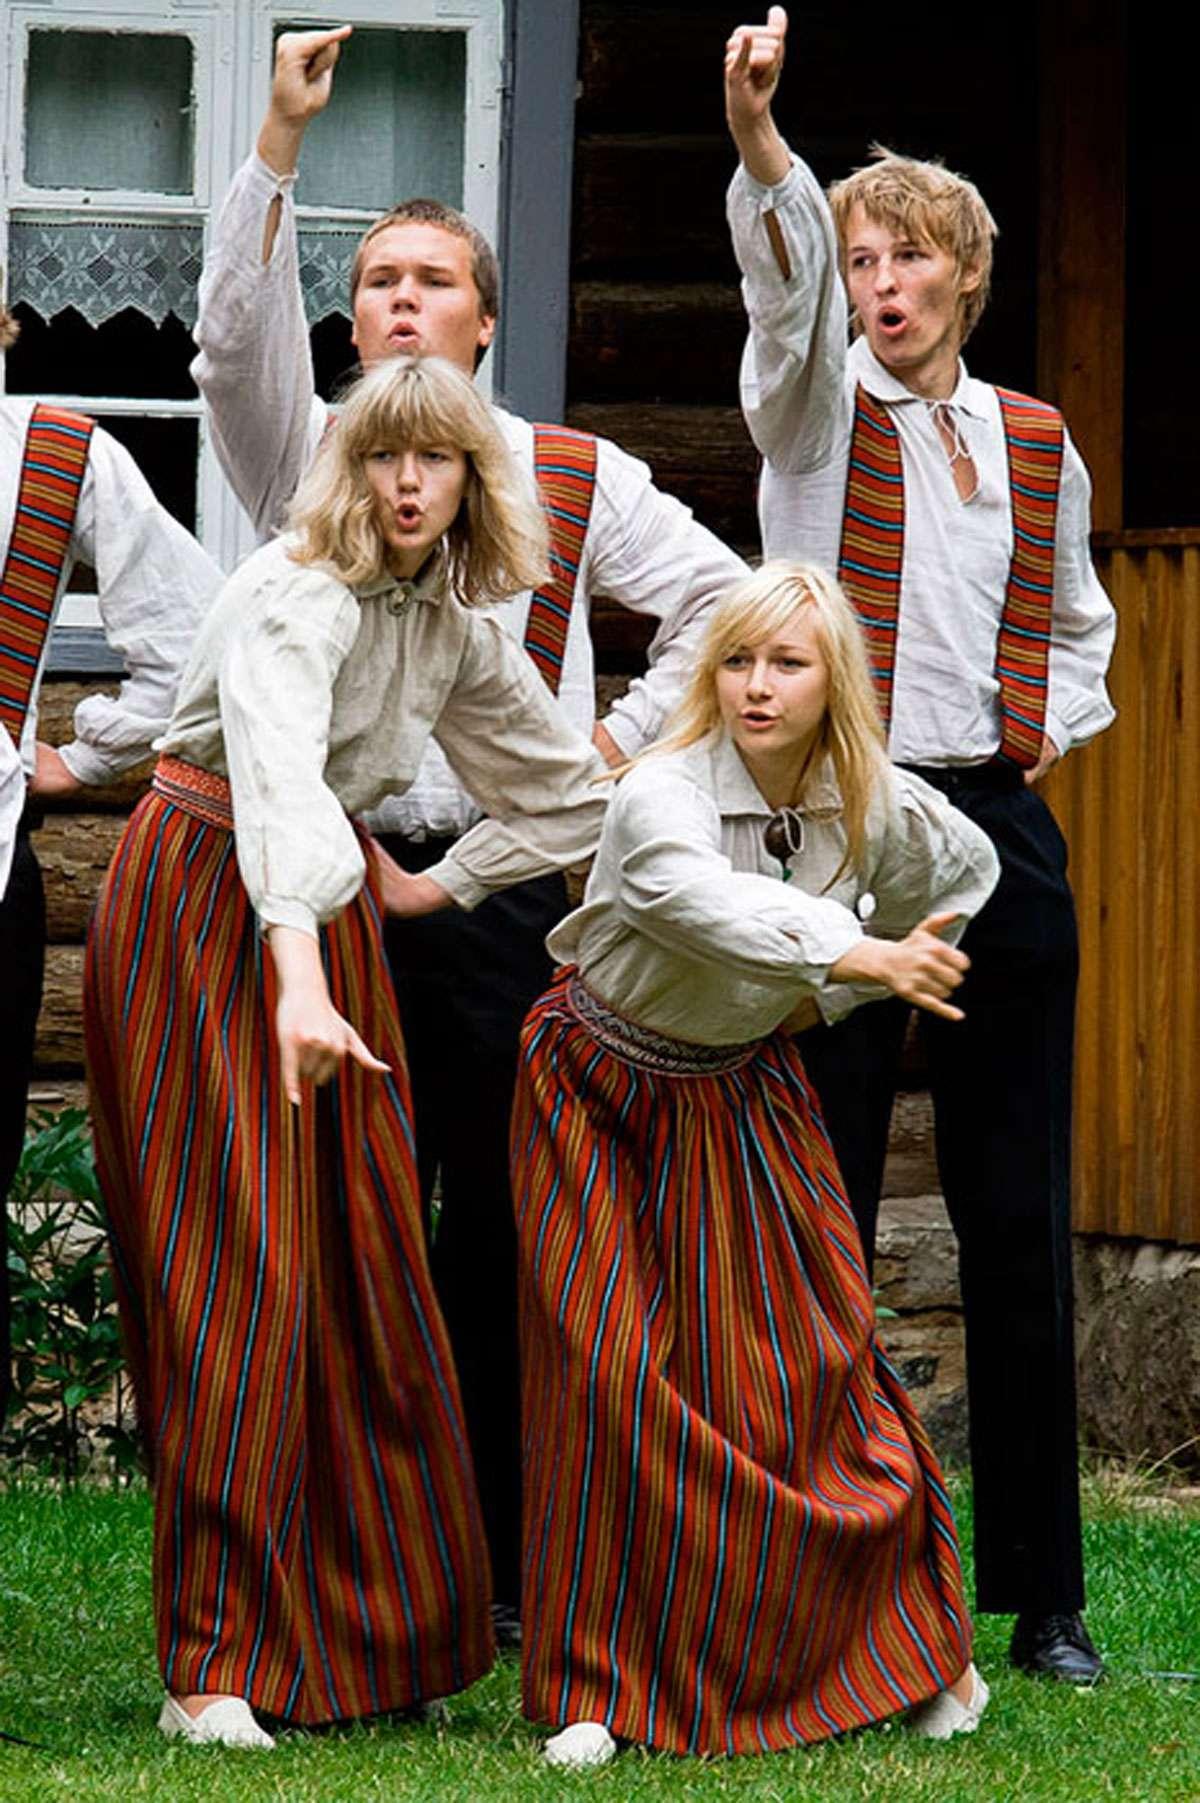 Kadi Kähär performs. Photo: Kadi Kähär